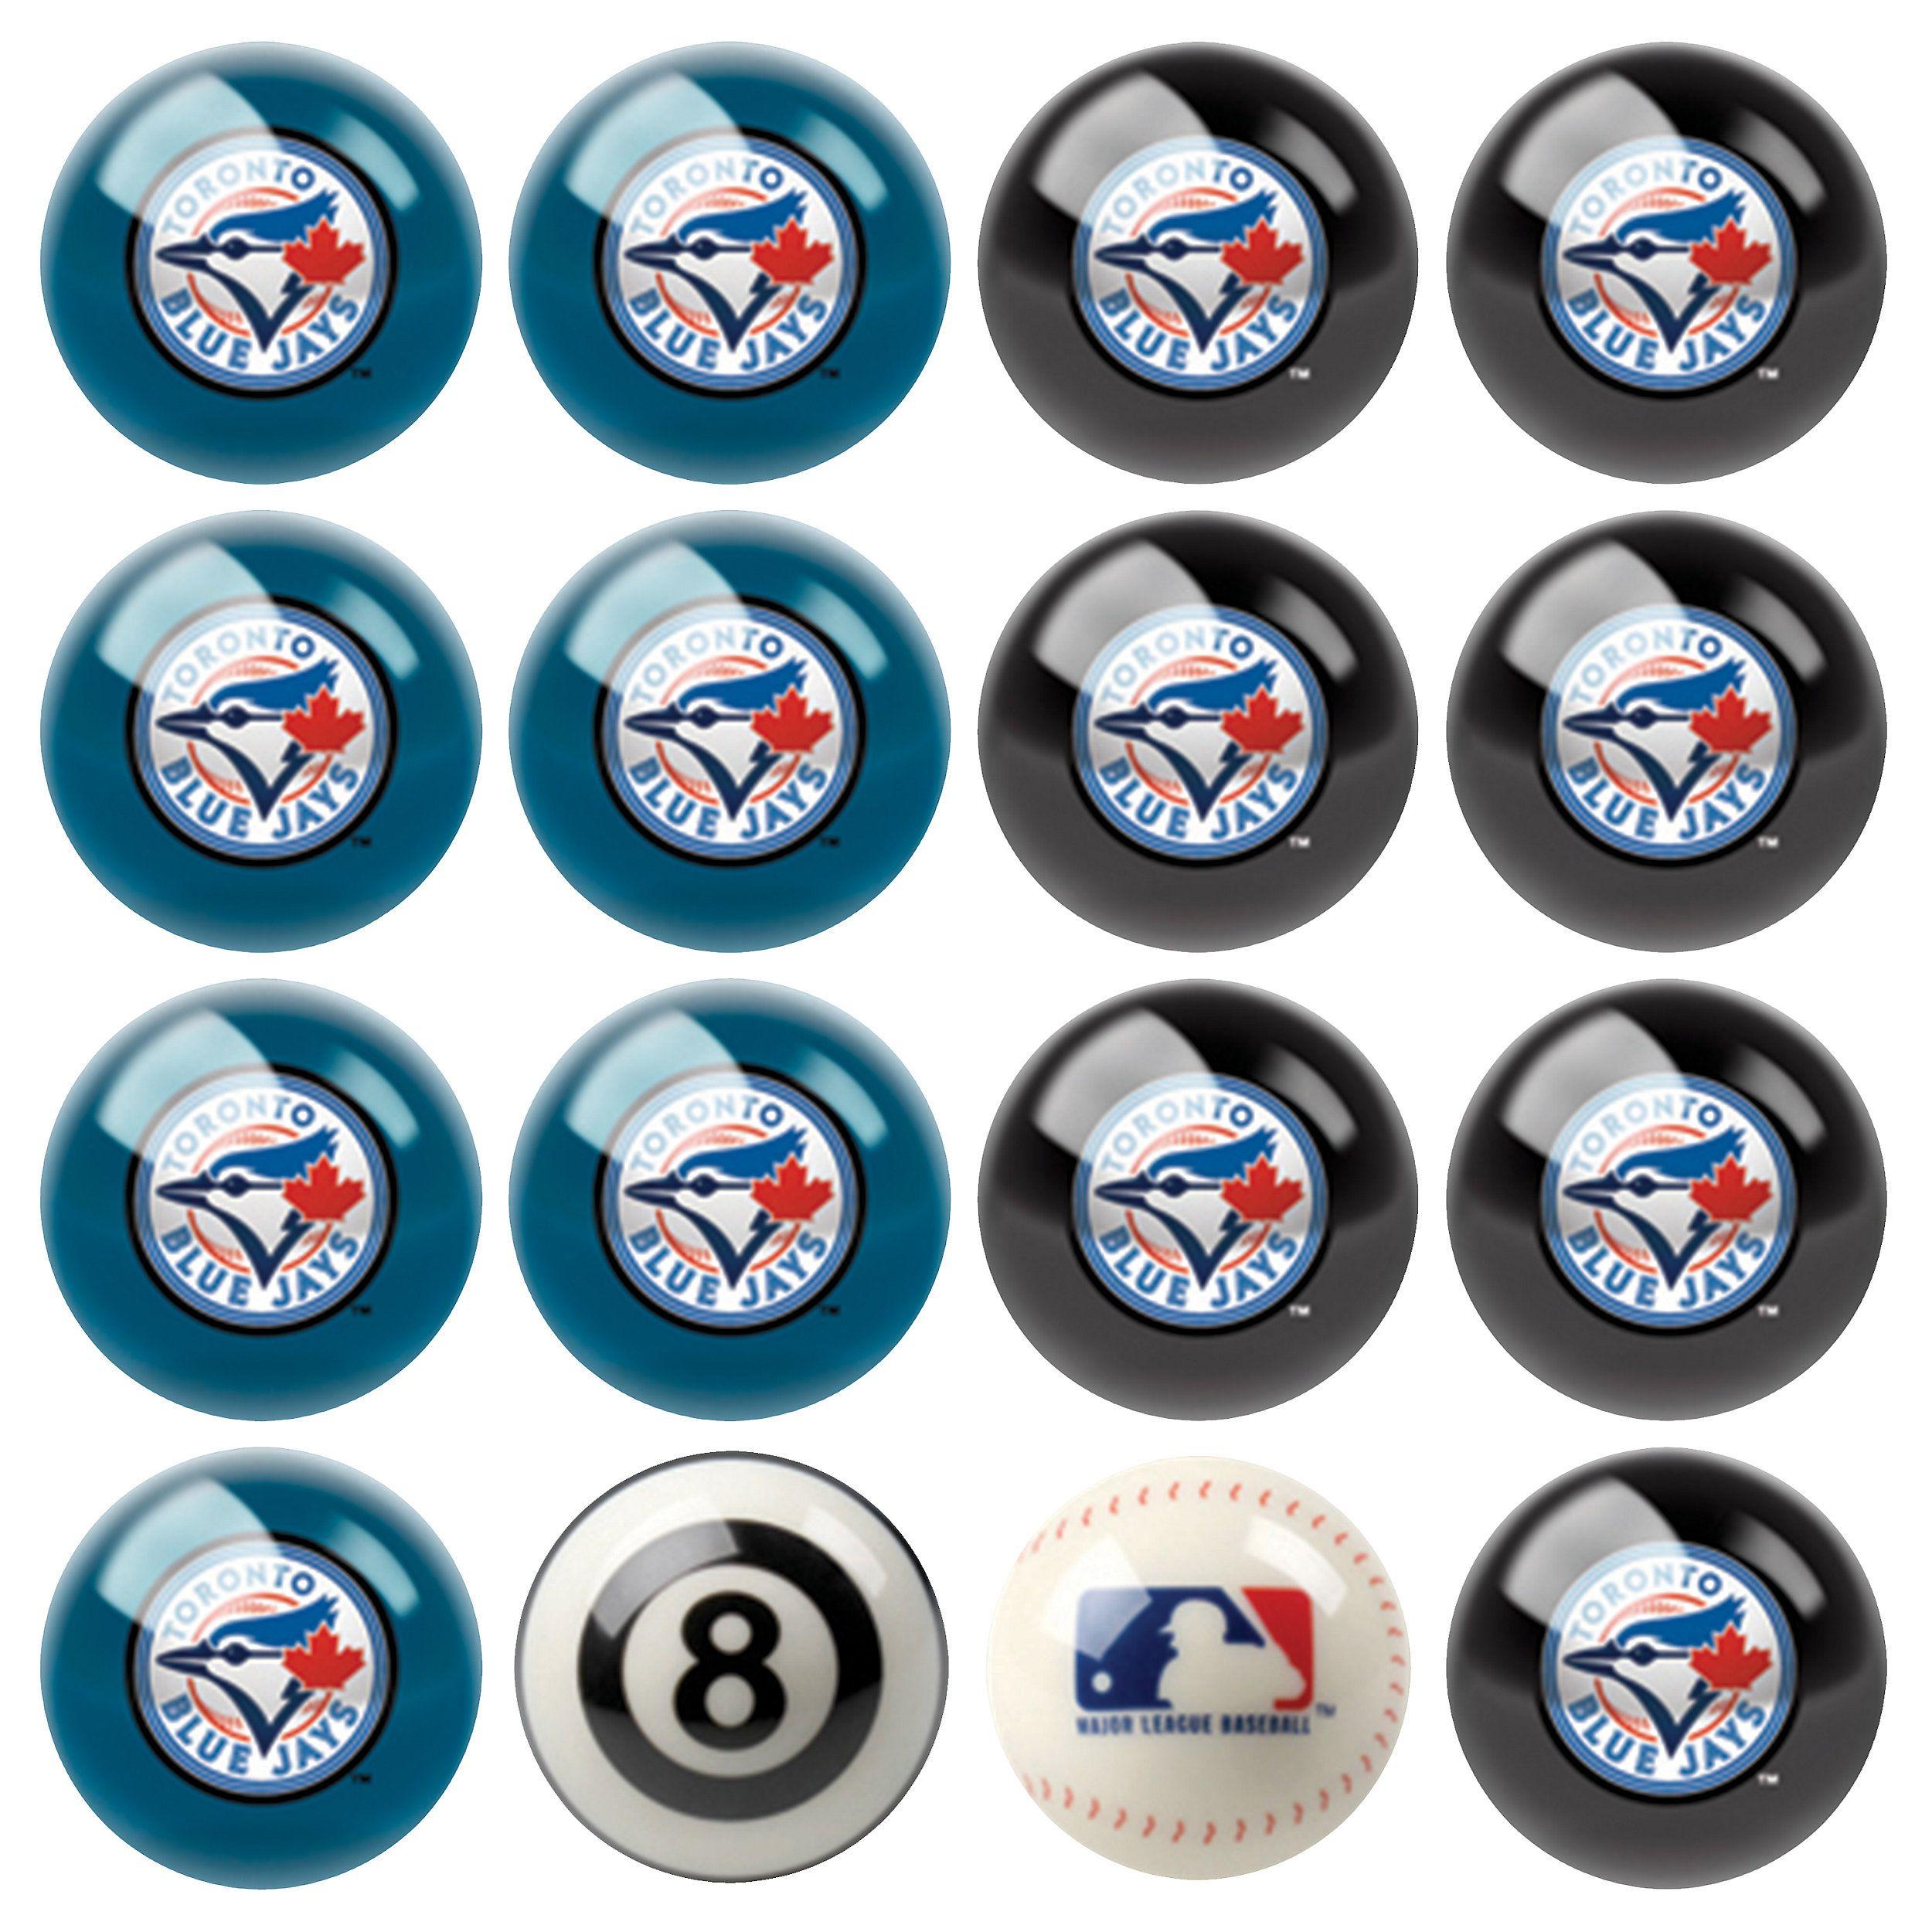 PERSONALIZED Toronto Blue Jays Light Switch Covers MLB Baseball Home Decor